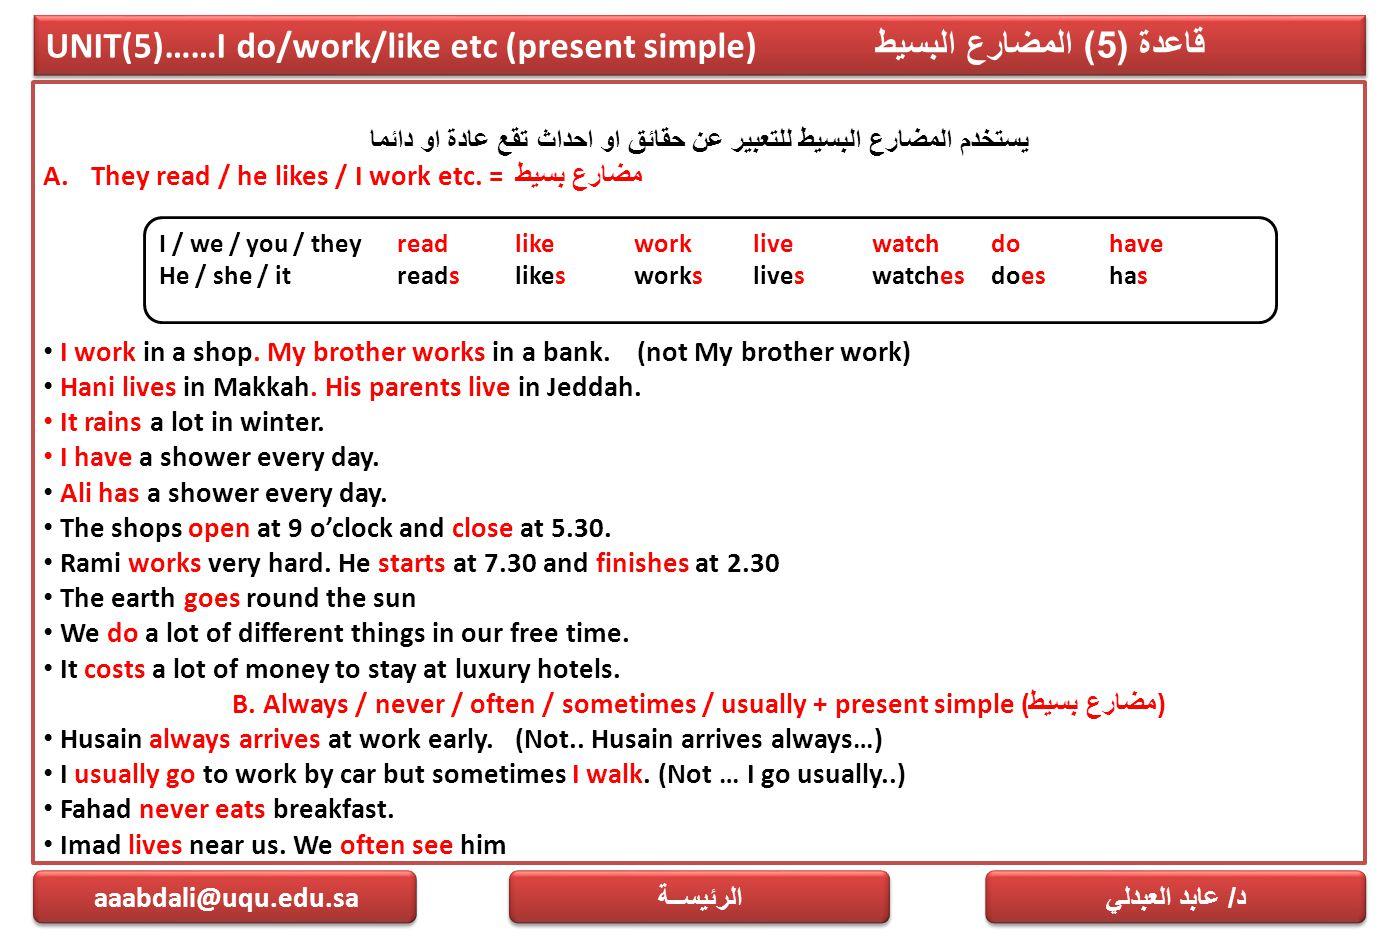 UNIT(5)……I do/work/like etc (present simple) قاعدة (5) المضارع البسيط يستخدم المضارع البسيط للتعبير عن حقائق او احداث تقع عادة او دائما A.They read /